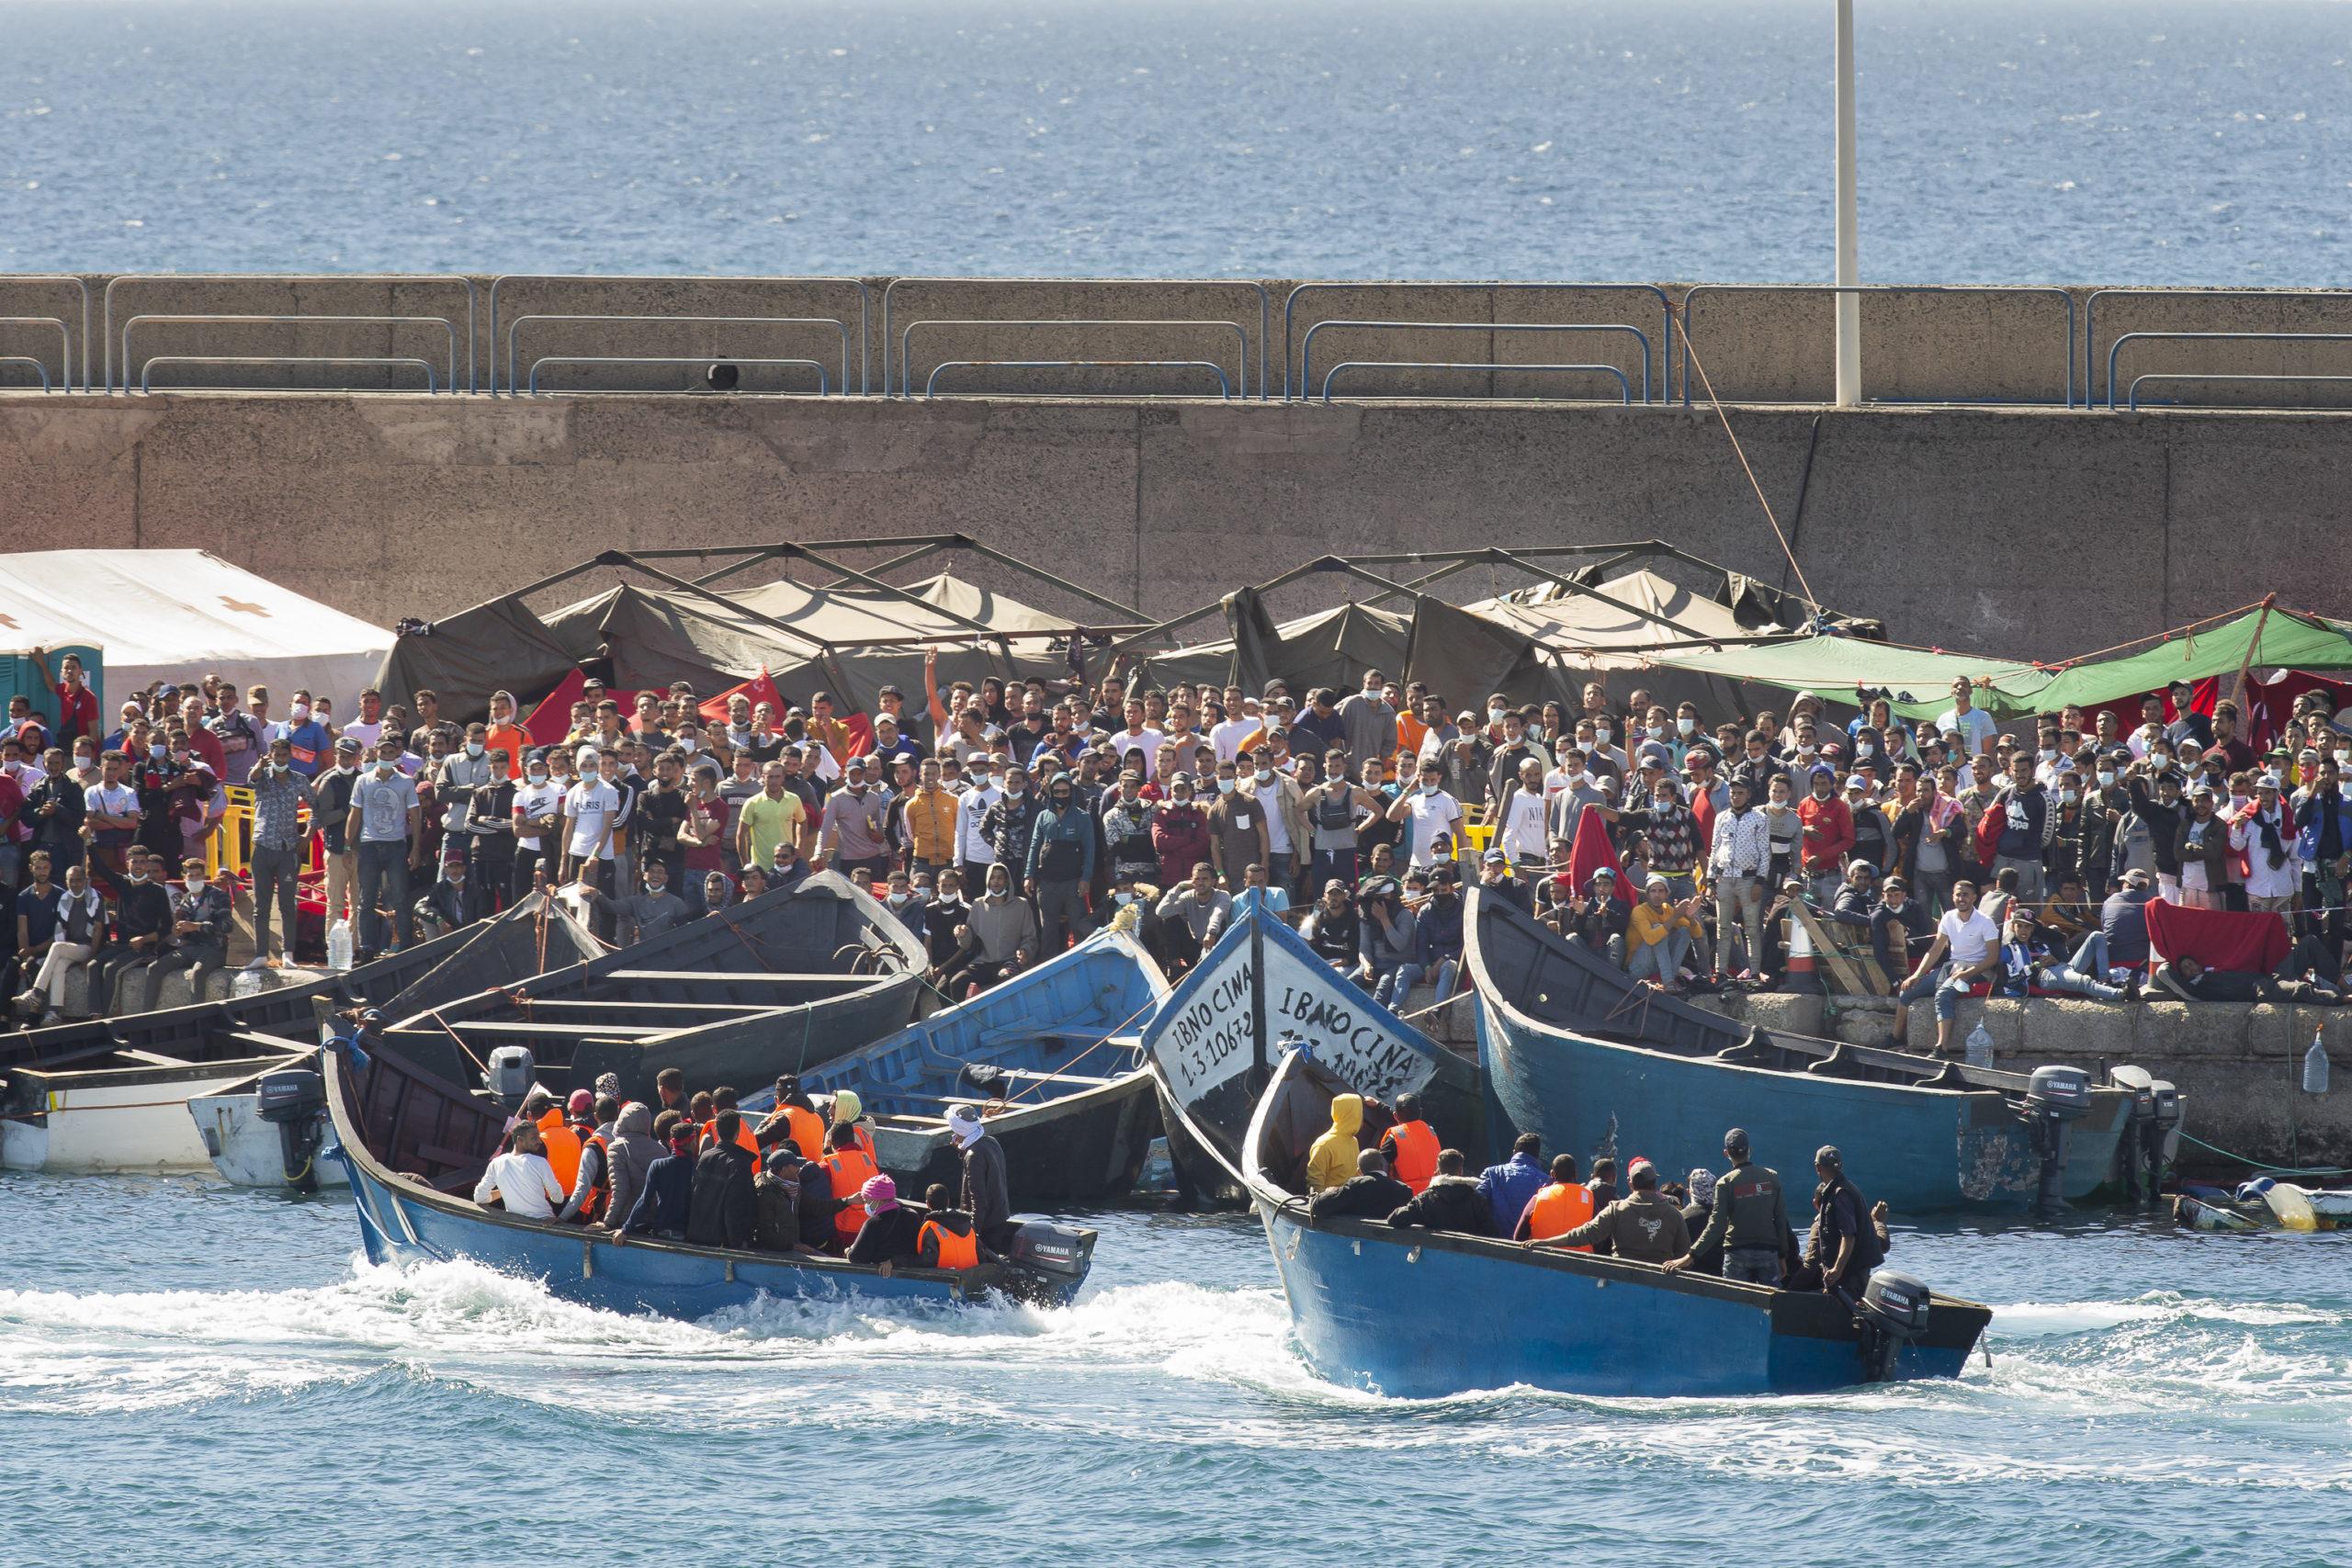 Llegada de pateras a Canarias